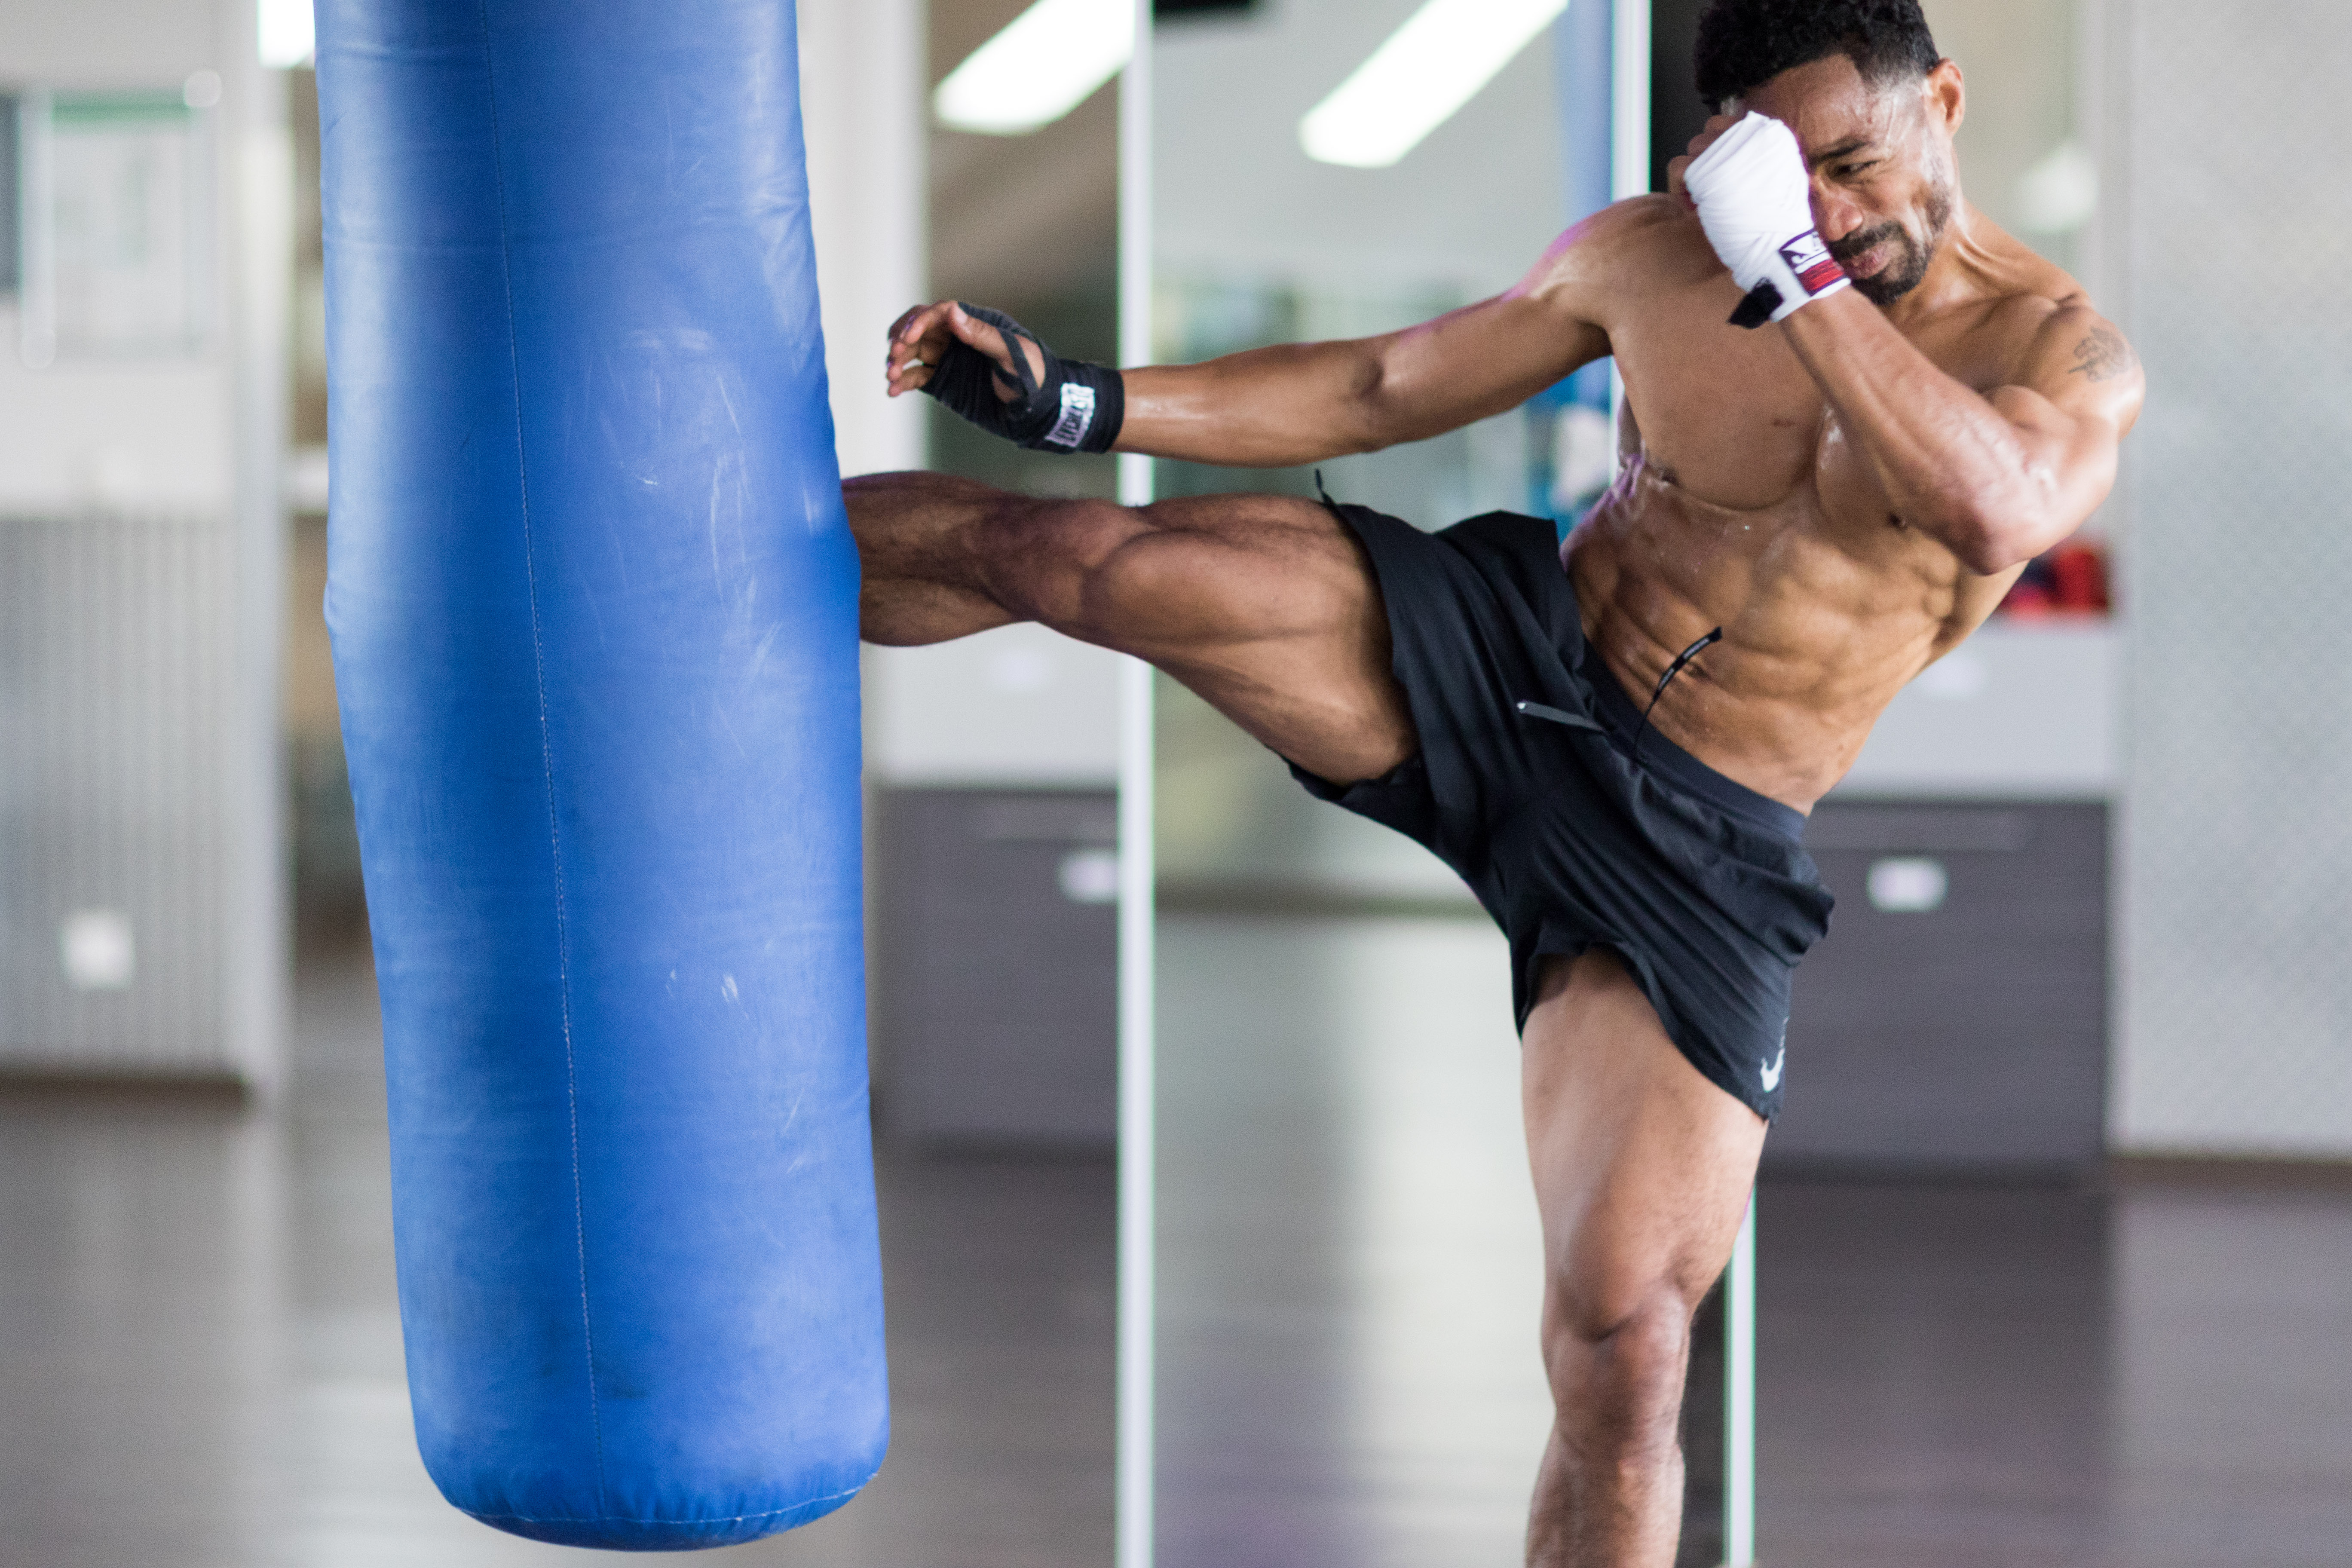 Light skin man kicking a blue punching bag without a shirt at Body up Giesing studios in Munich Germ